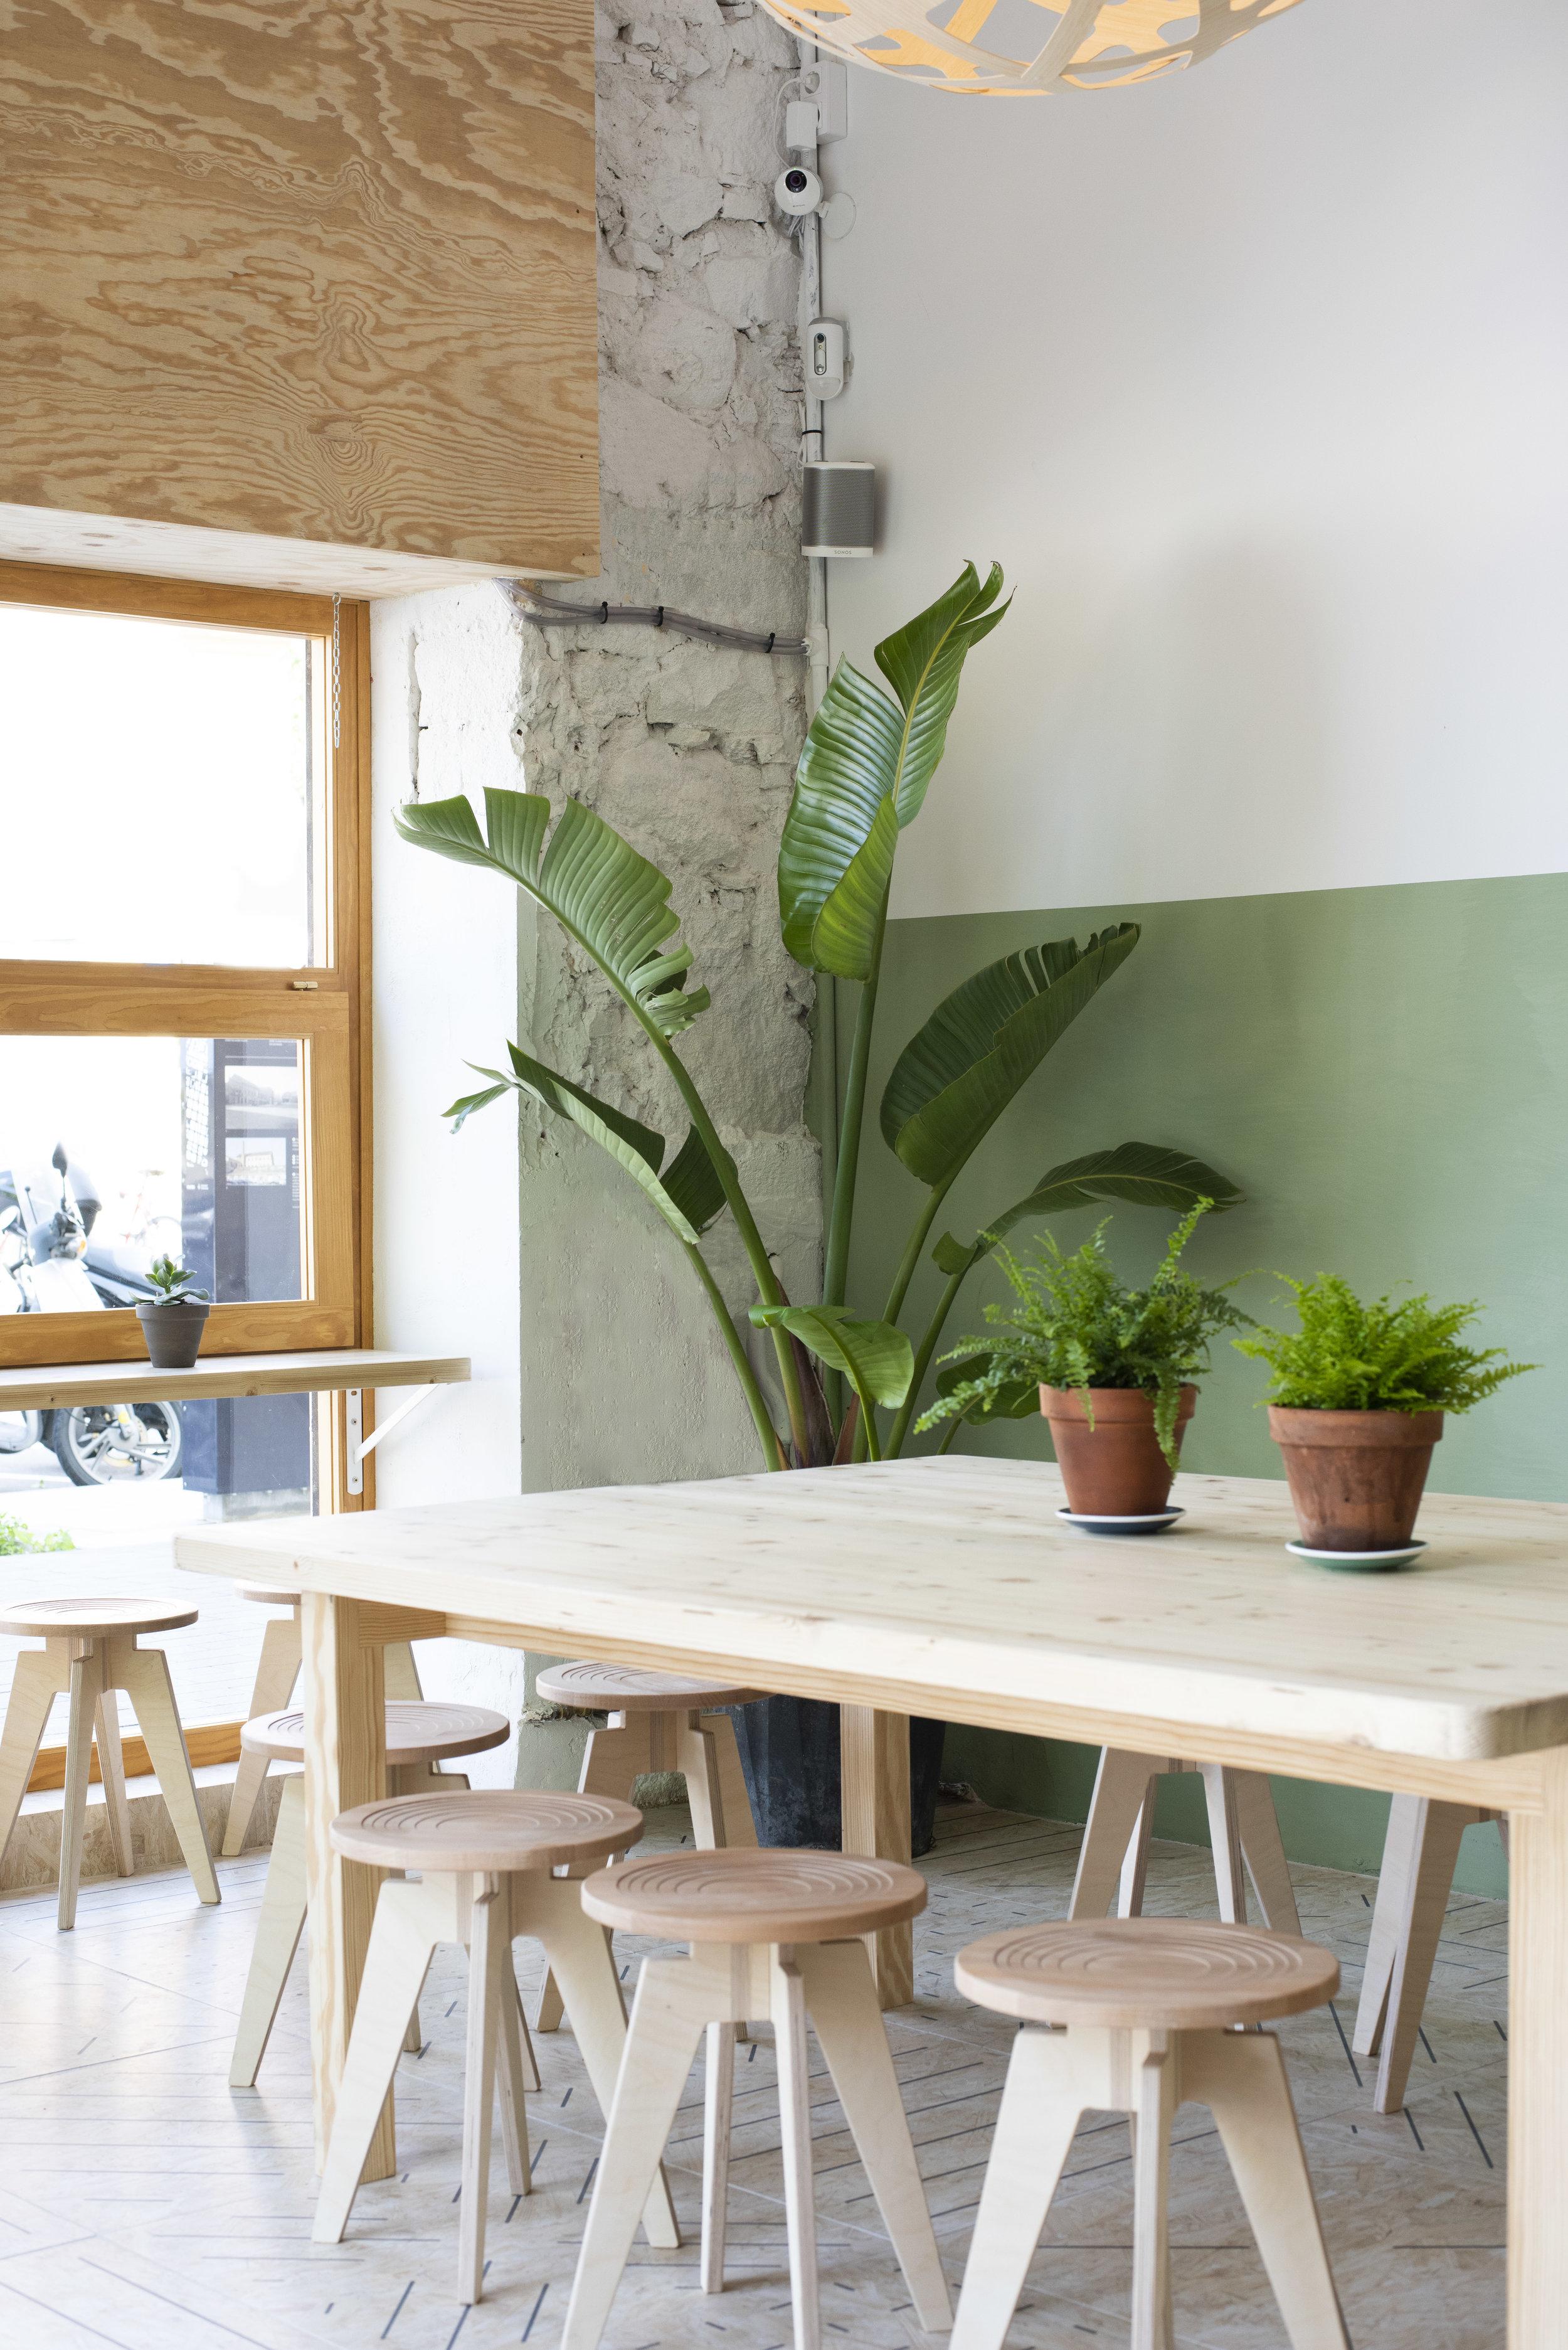 Little Fern Cafe, Barcelona